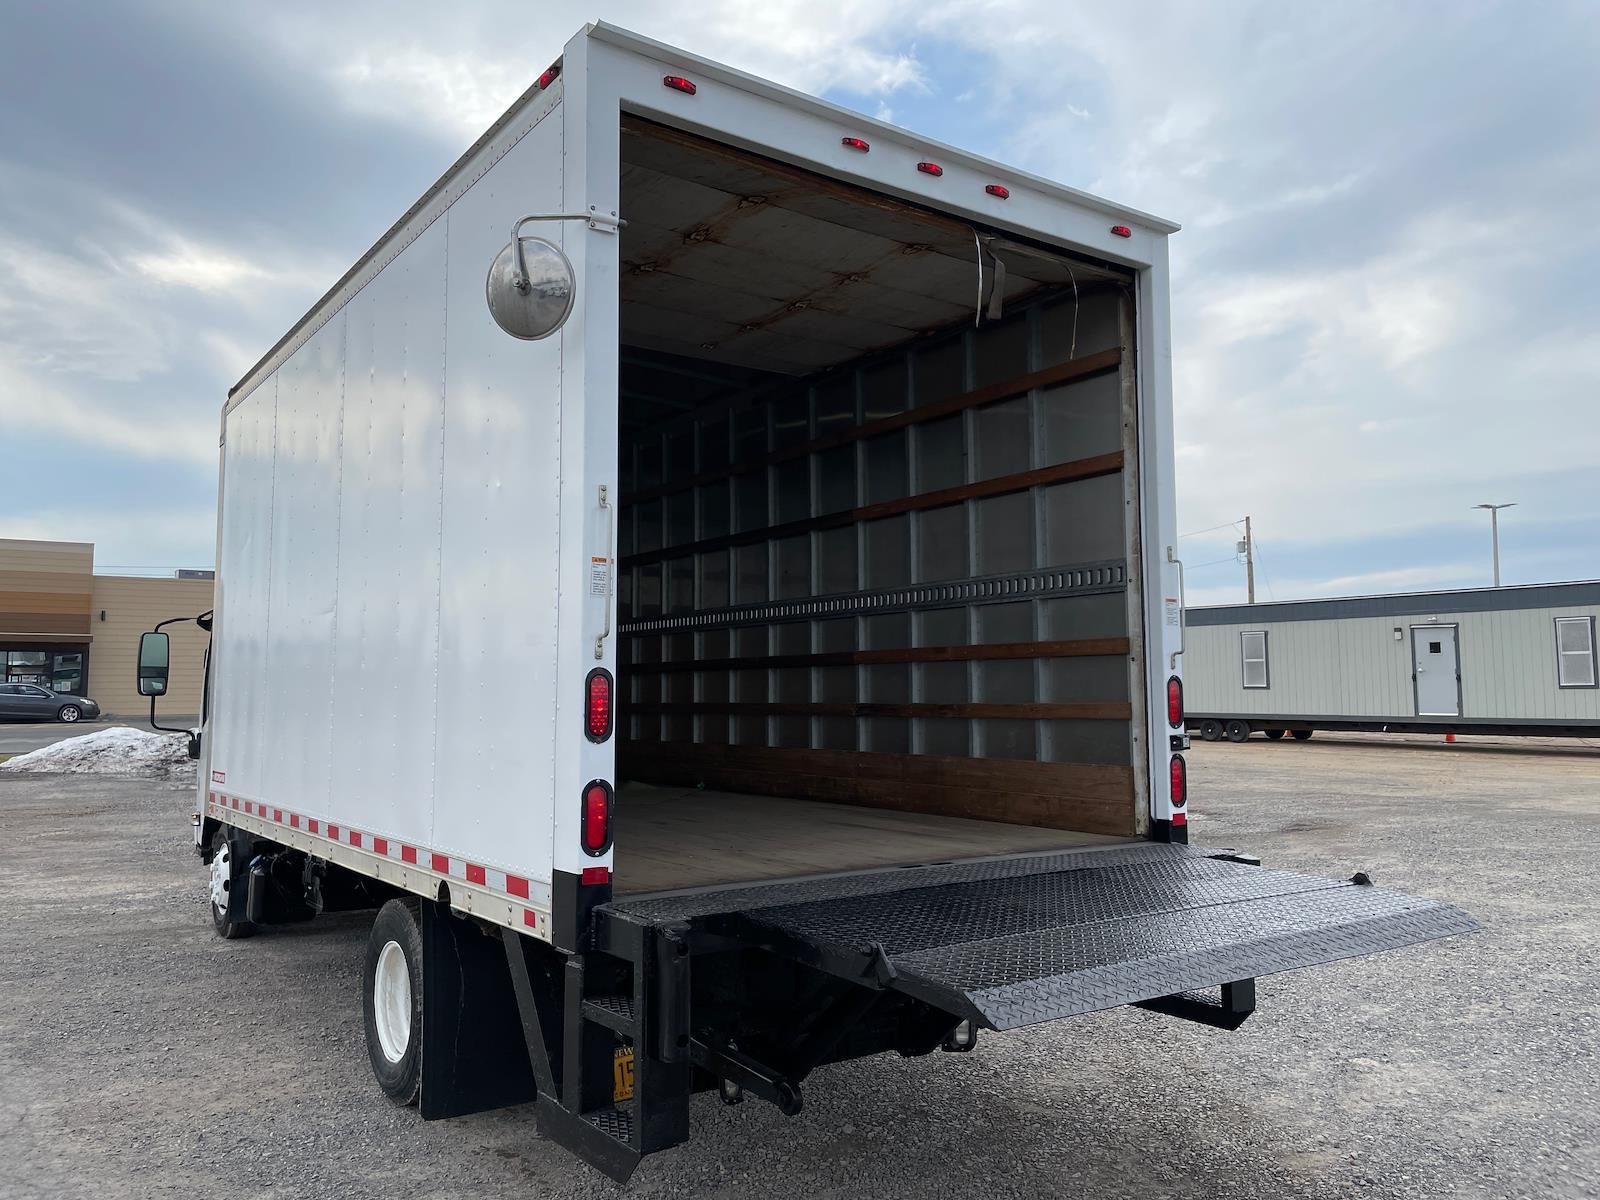 2015 Isuzu NPR-HD Regular Cab 4x2, Dry Freight #651329 - photo 1